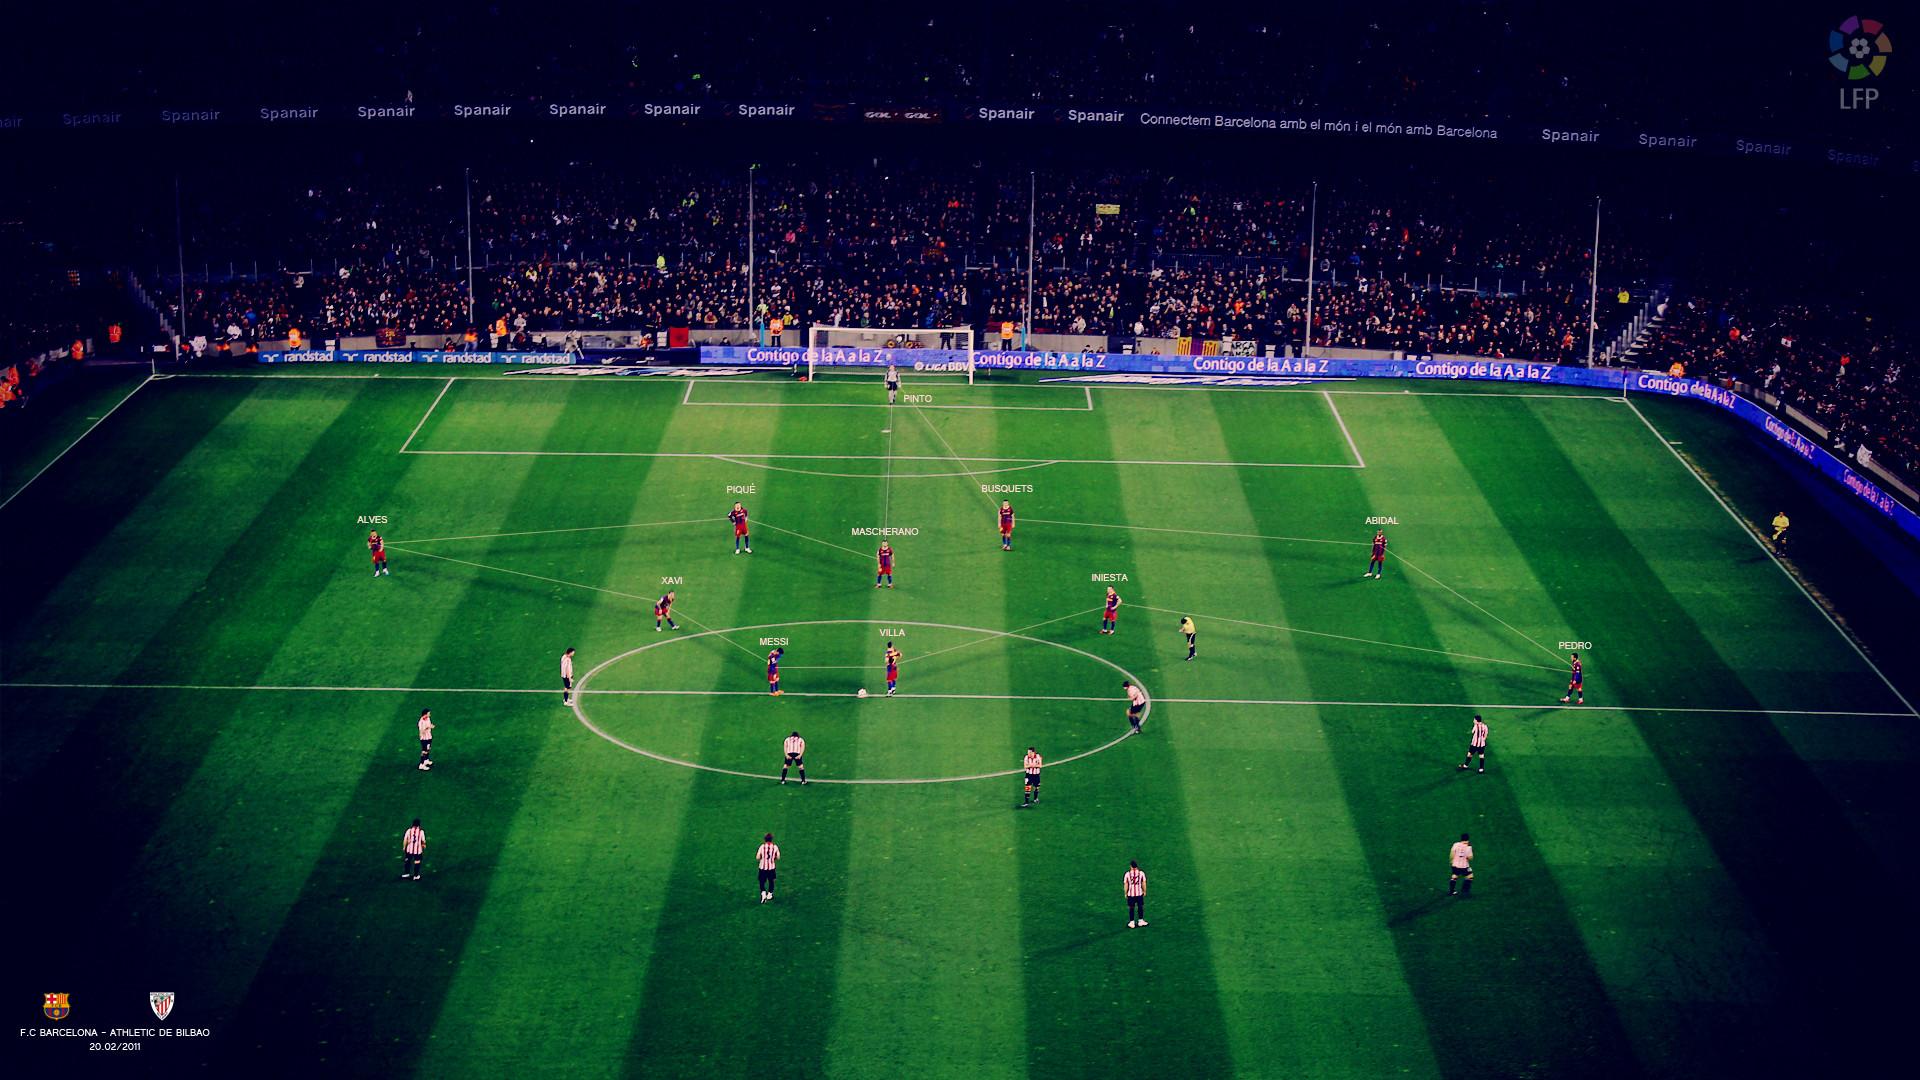 Fondo De Fútbol Hd: HD Soccer Stadium Wallpaper (65+ Images